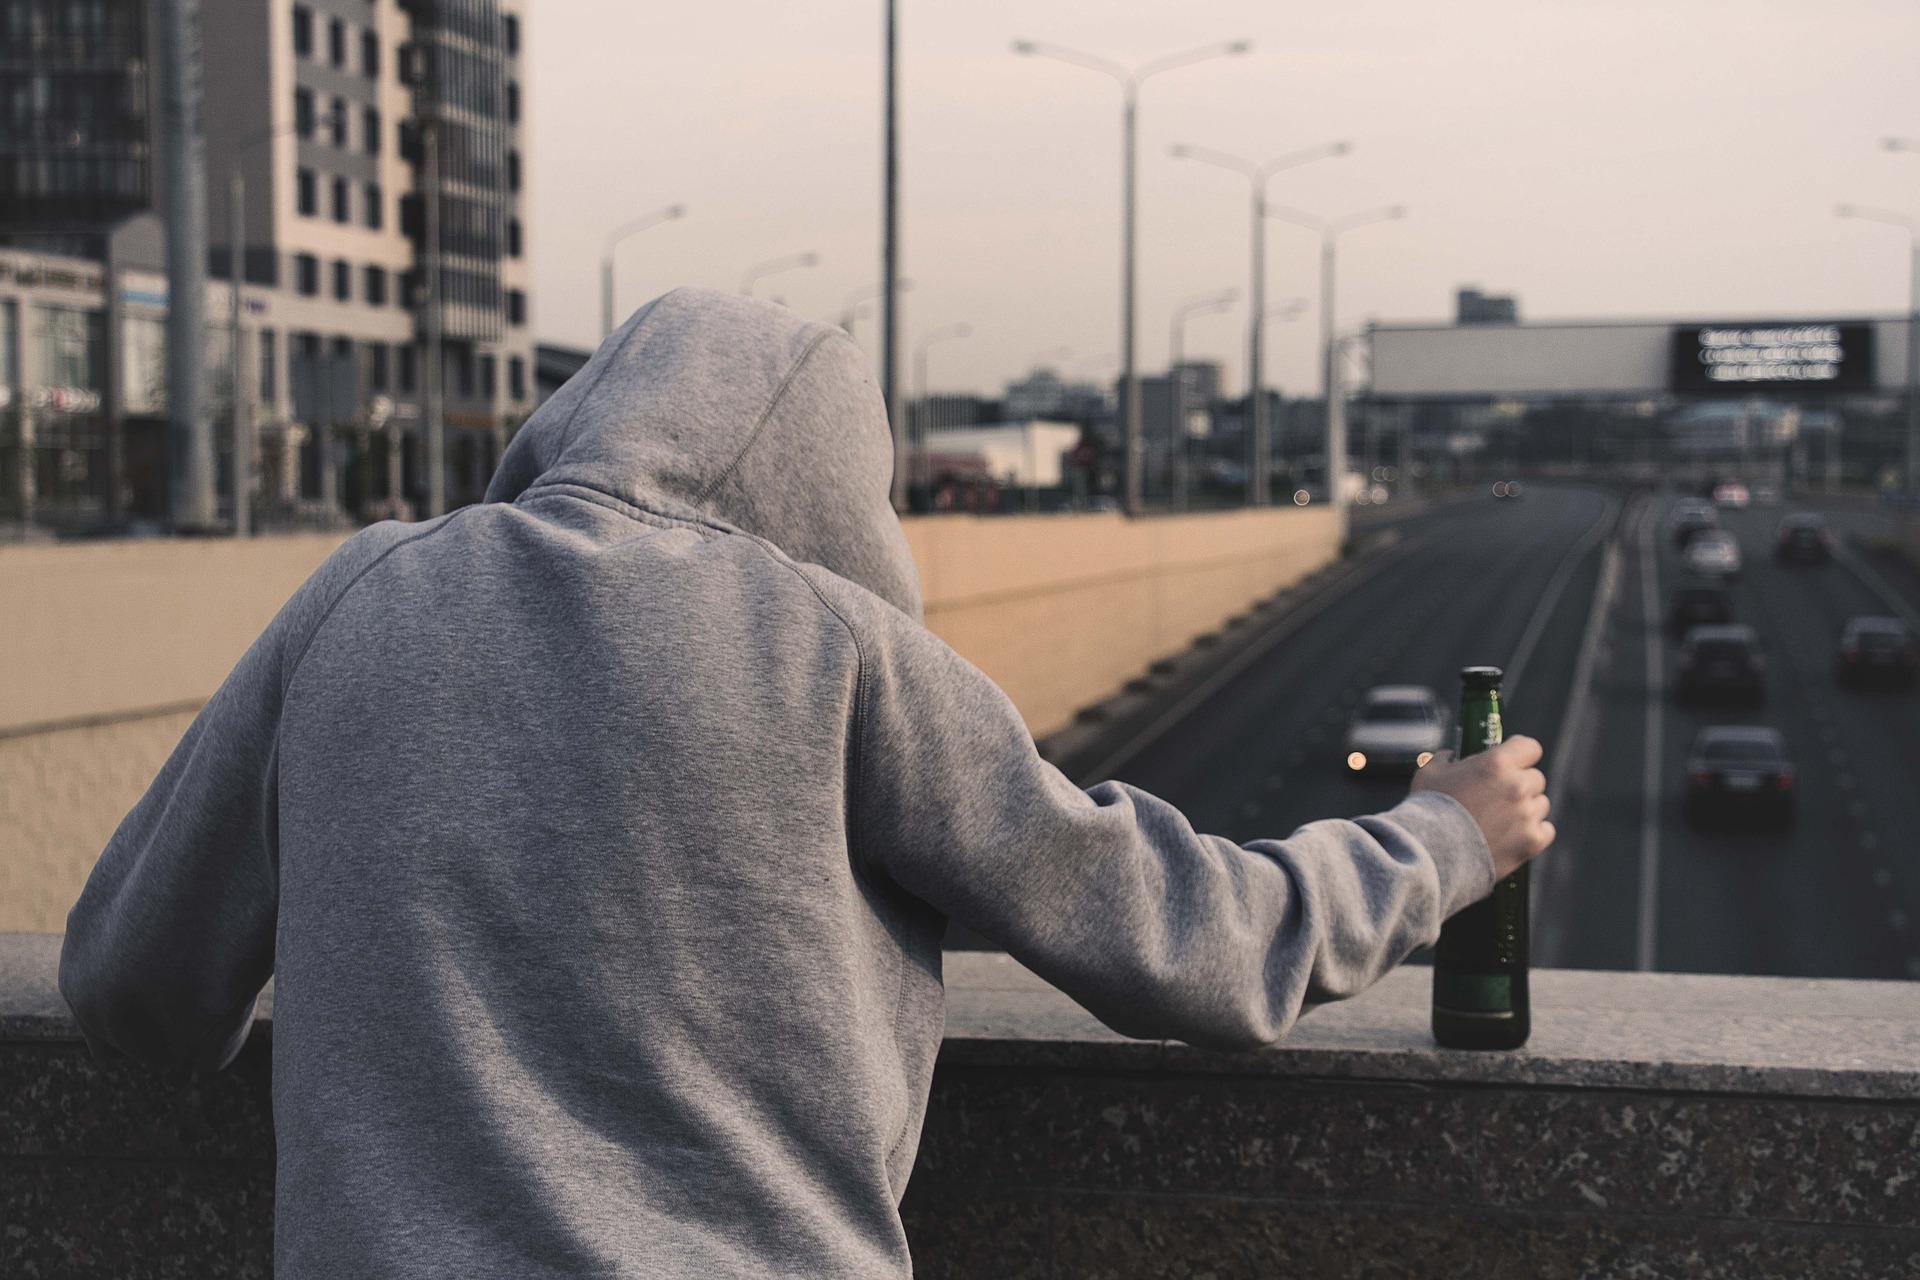 substance abuse image